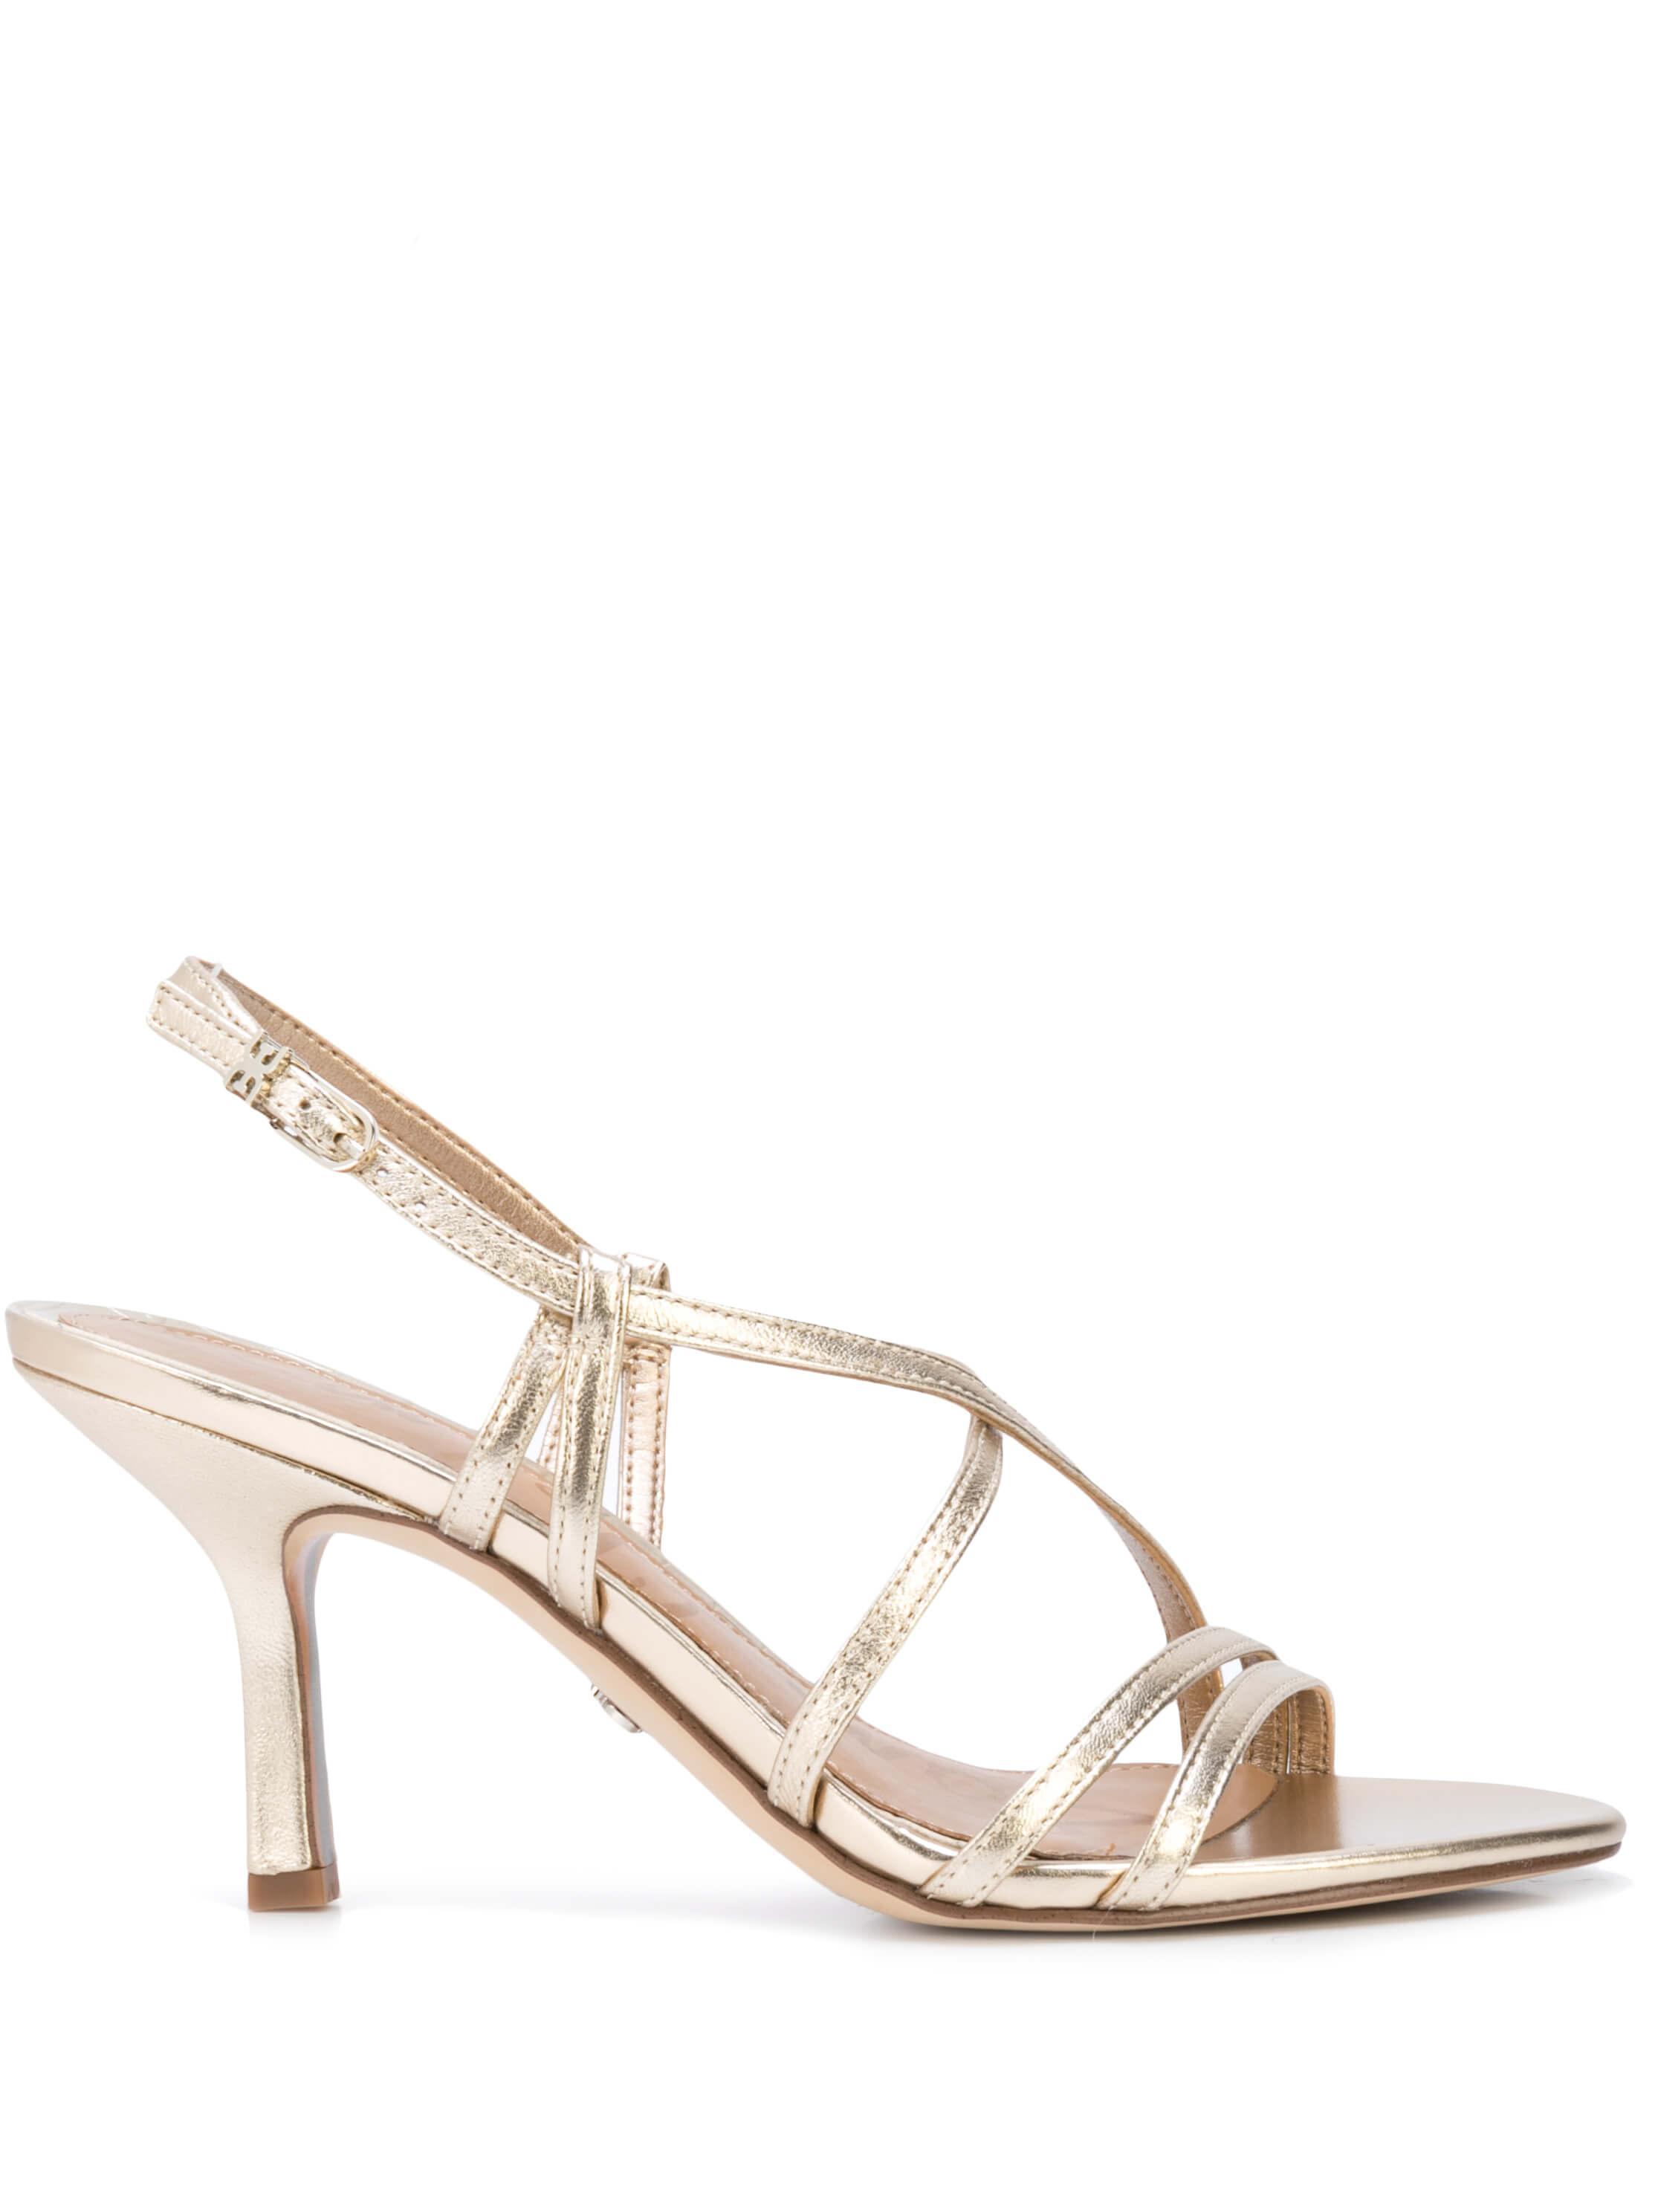 Paislee Metallic Strappy Sandal